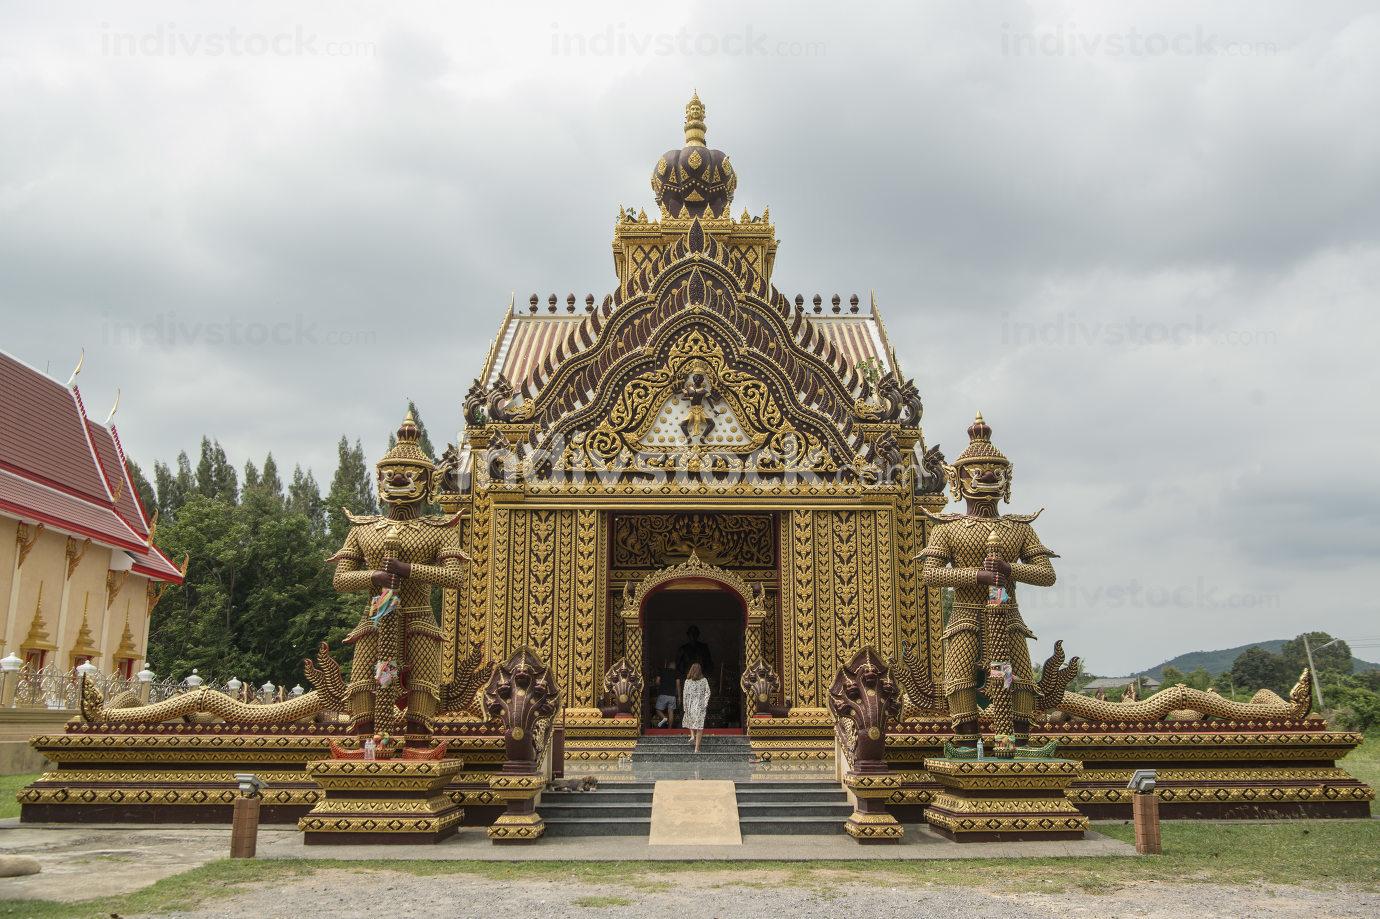 ASIA THAILAND HUA HIN WAT KHAO KA LOK